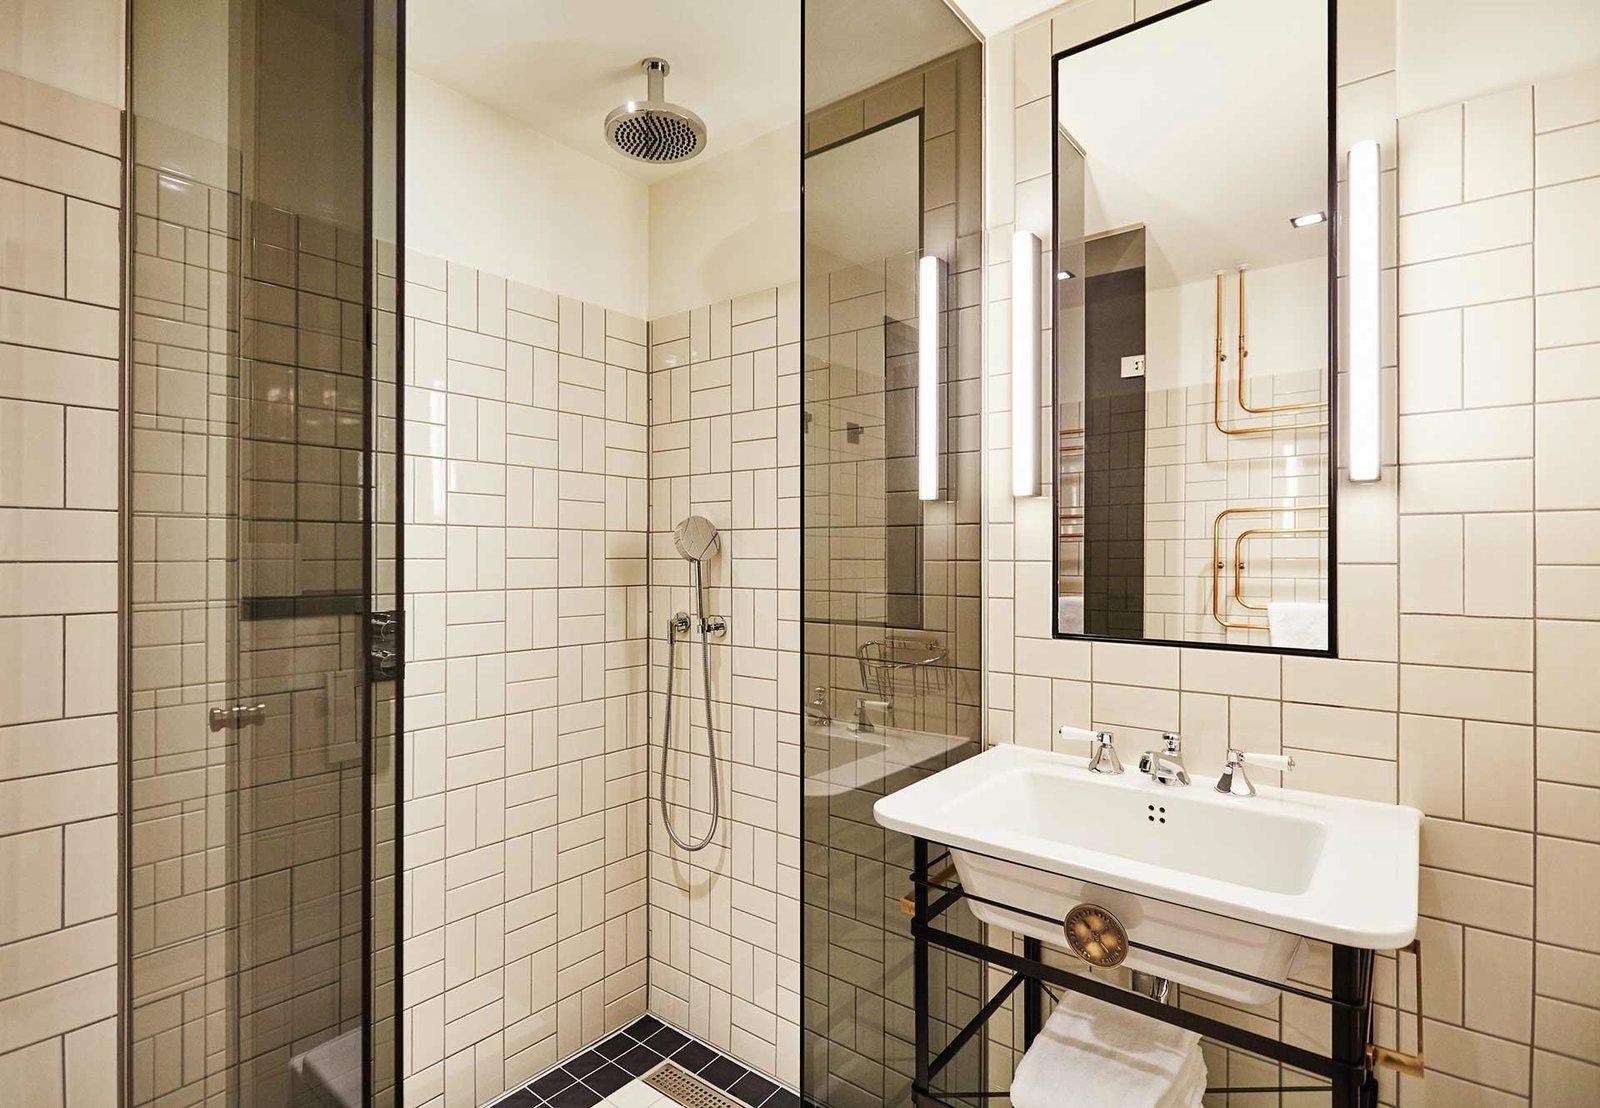 Bath Room, Corner Shower, Pedestal Sink, and Wall Lighting  The Hoxton Amsterdam